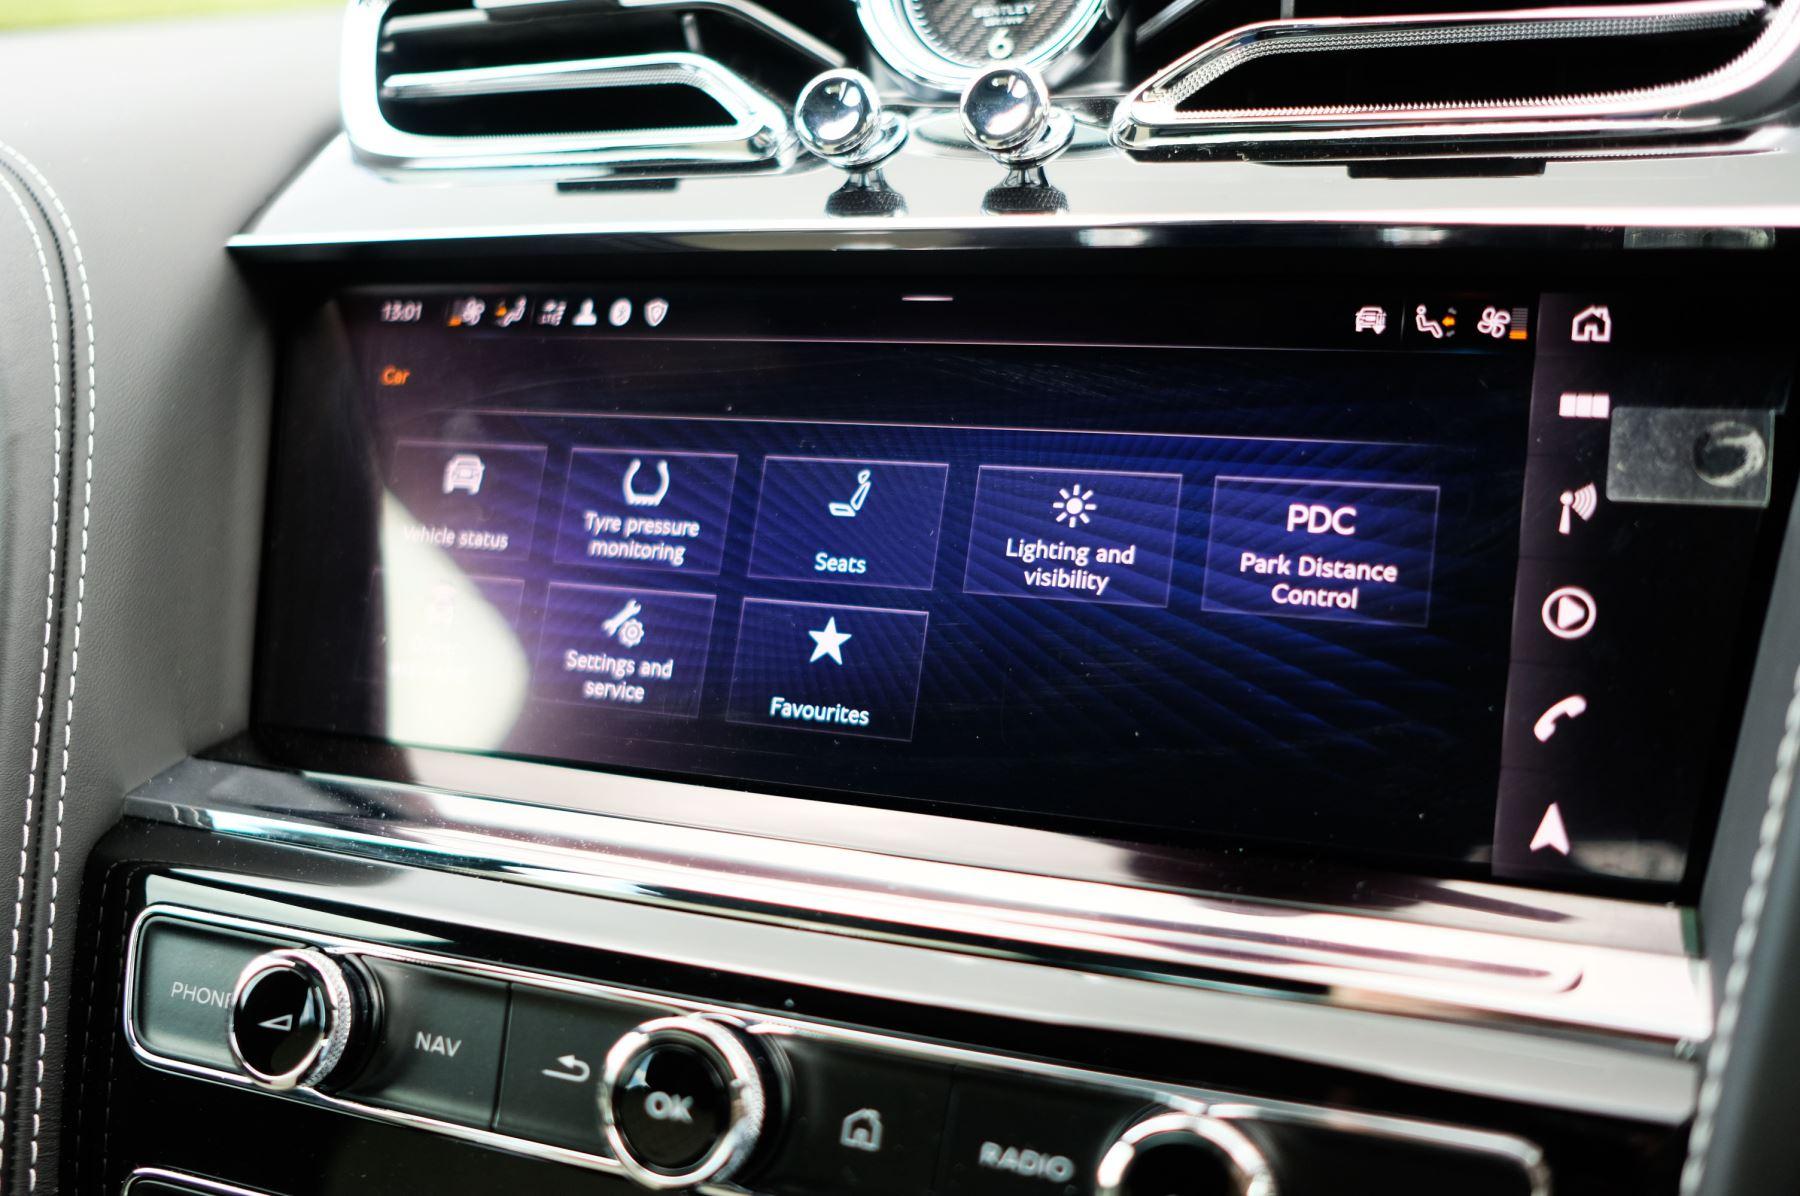 Bentley Bentayga 4.0 V8 - Mulliner Driving Specification for Black Specification image 22